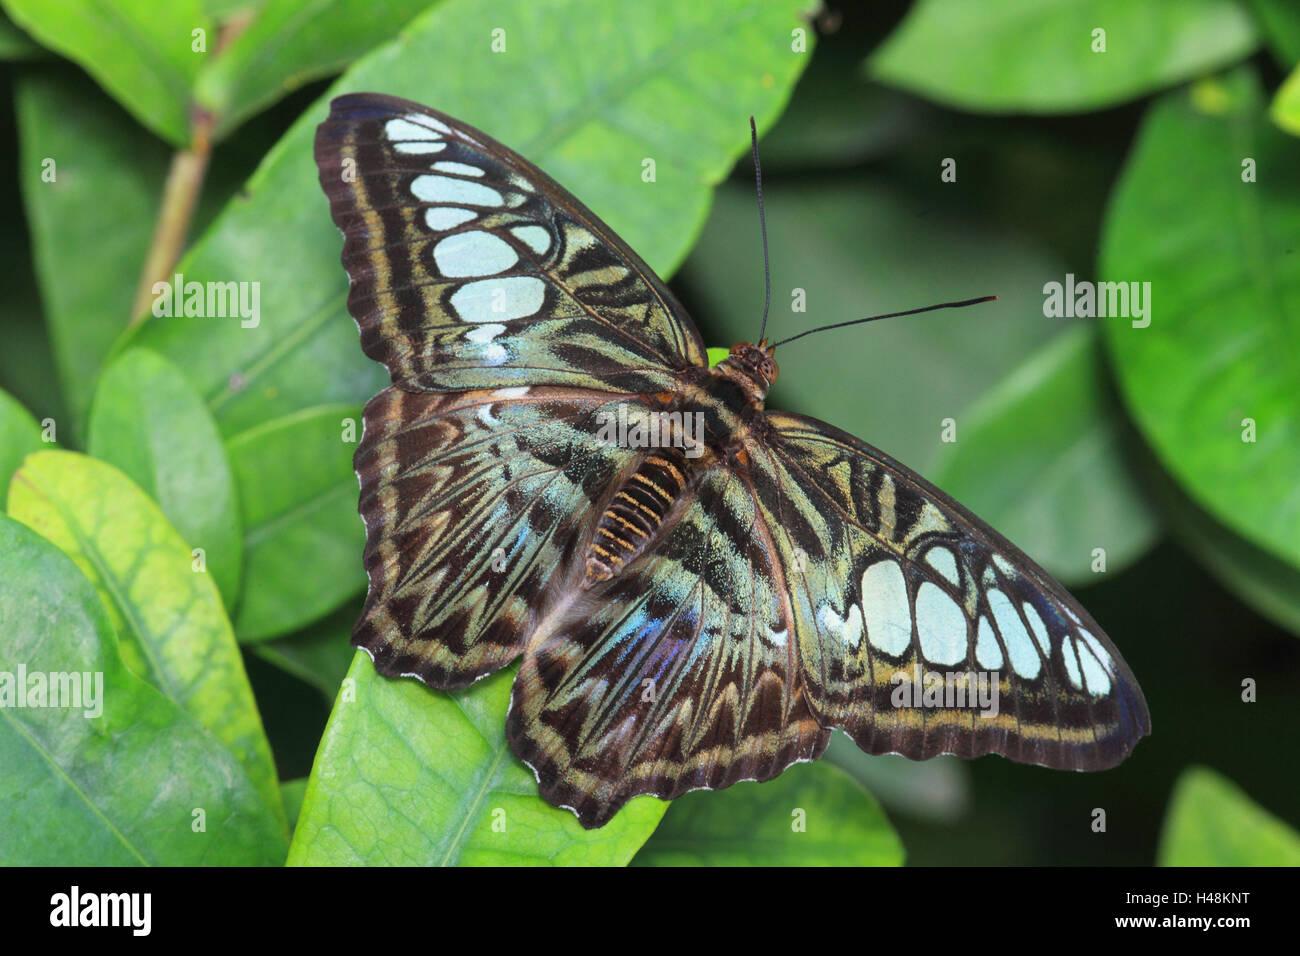 Les papillons du tigre, medium close-up, format Paysage, l'Asie, insecte, animal sauvage, papillon, animal, Photo Stock